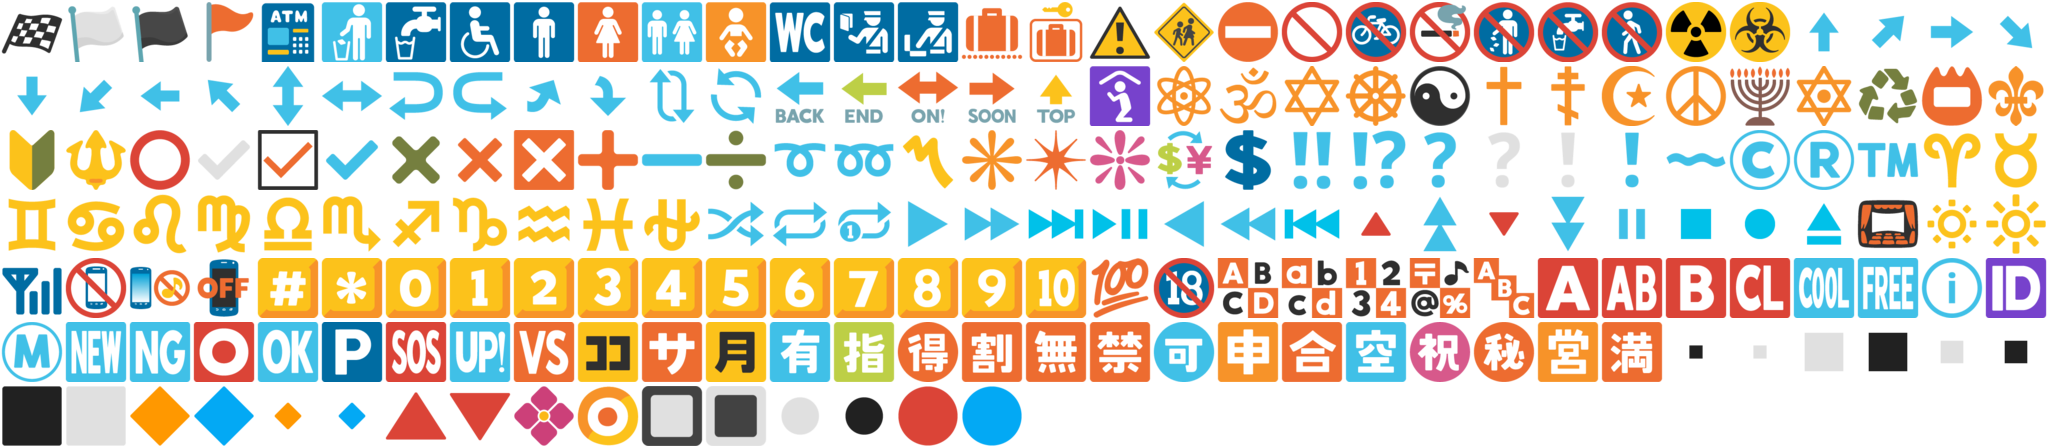 briar-android/assets/emoji_symbols.png